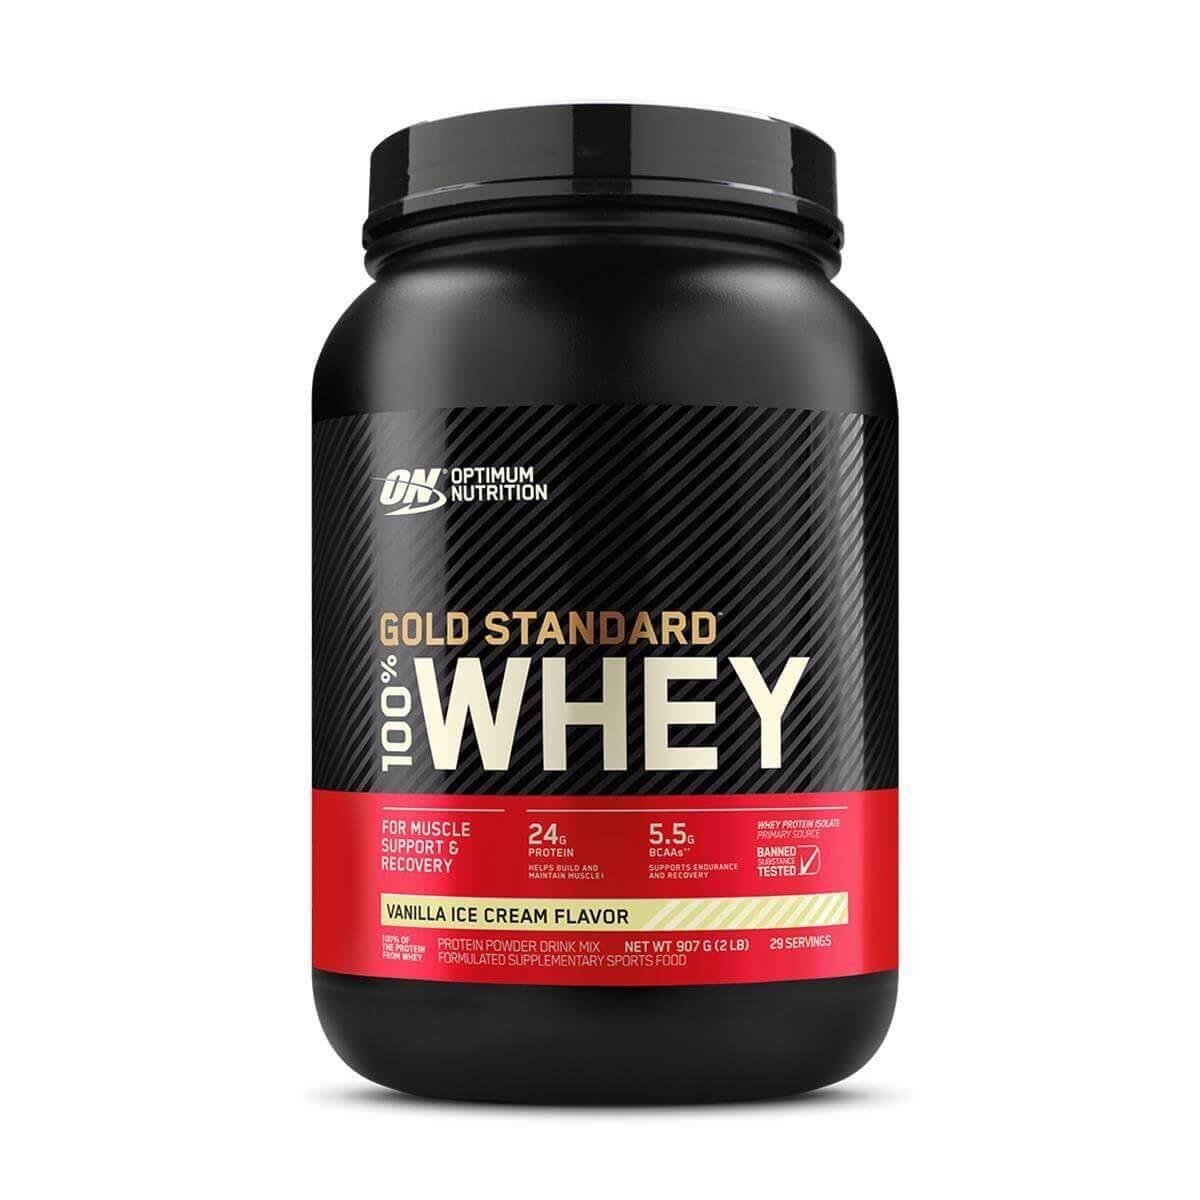 3639c5411 100% WHEY GOLD STANDARD - Optimum Nutrition